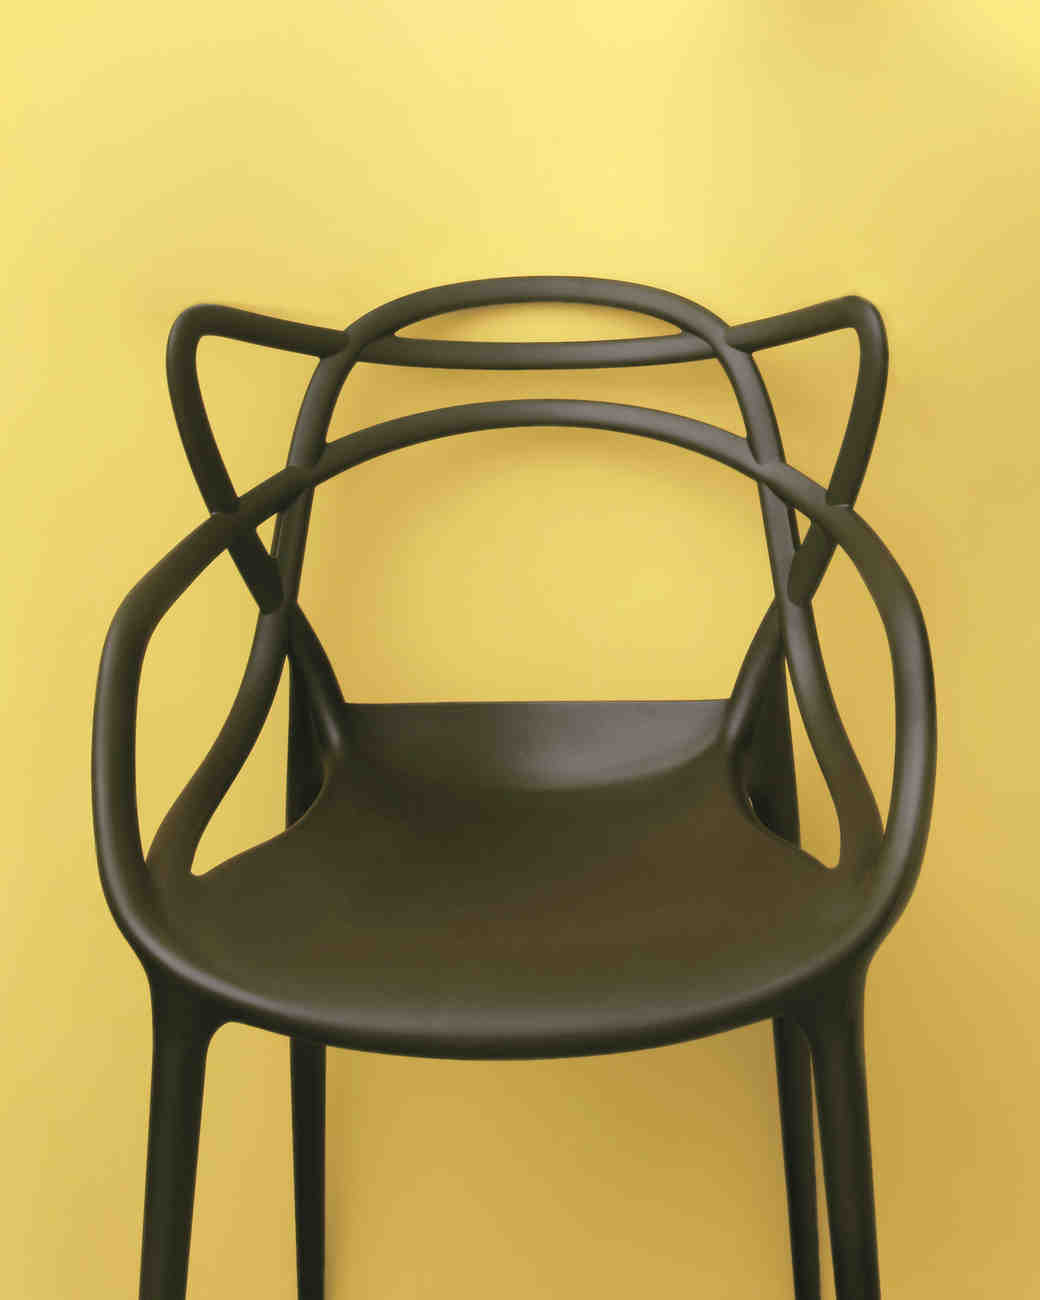 angel-sanchez-chair-mwd108878.jpg